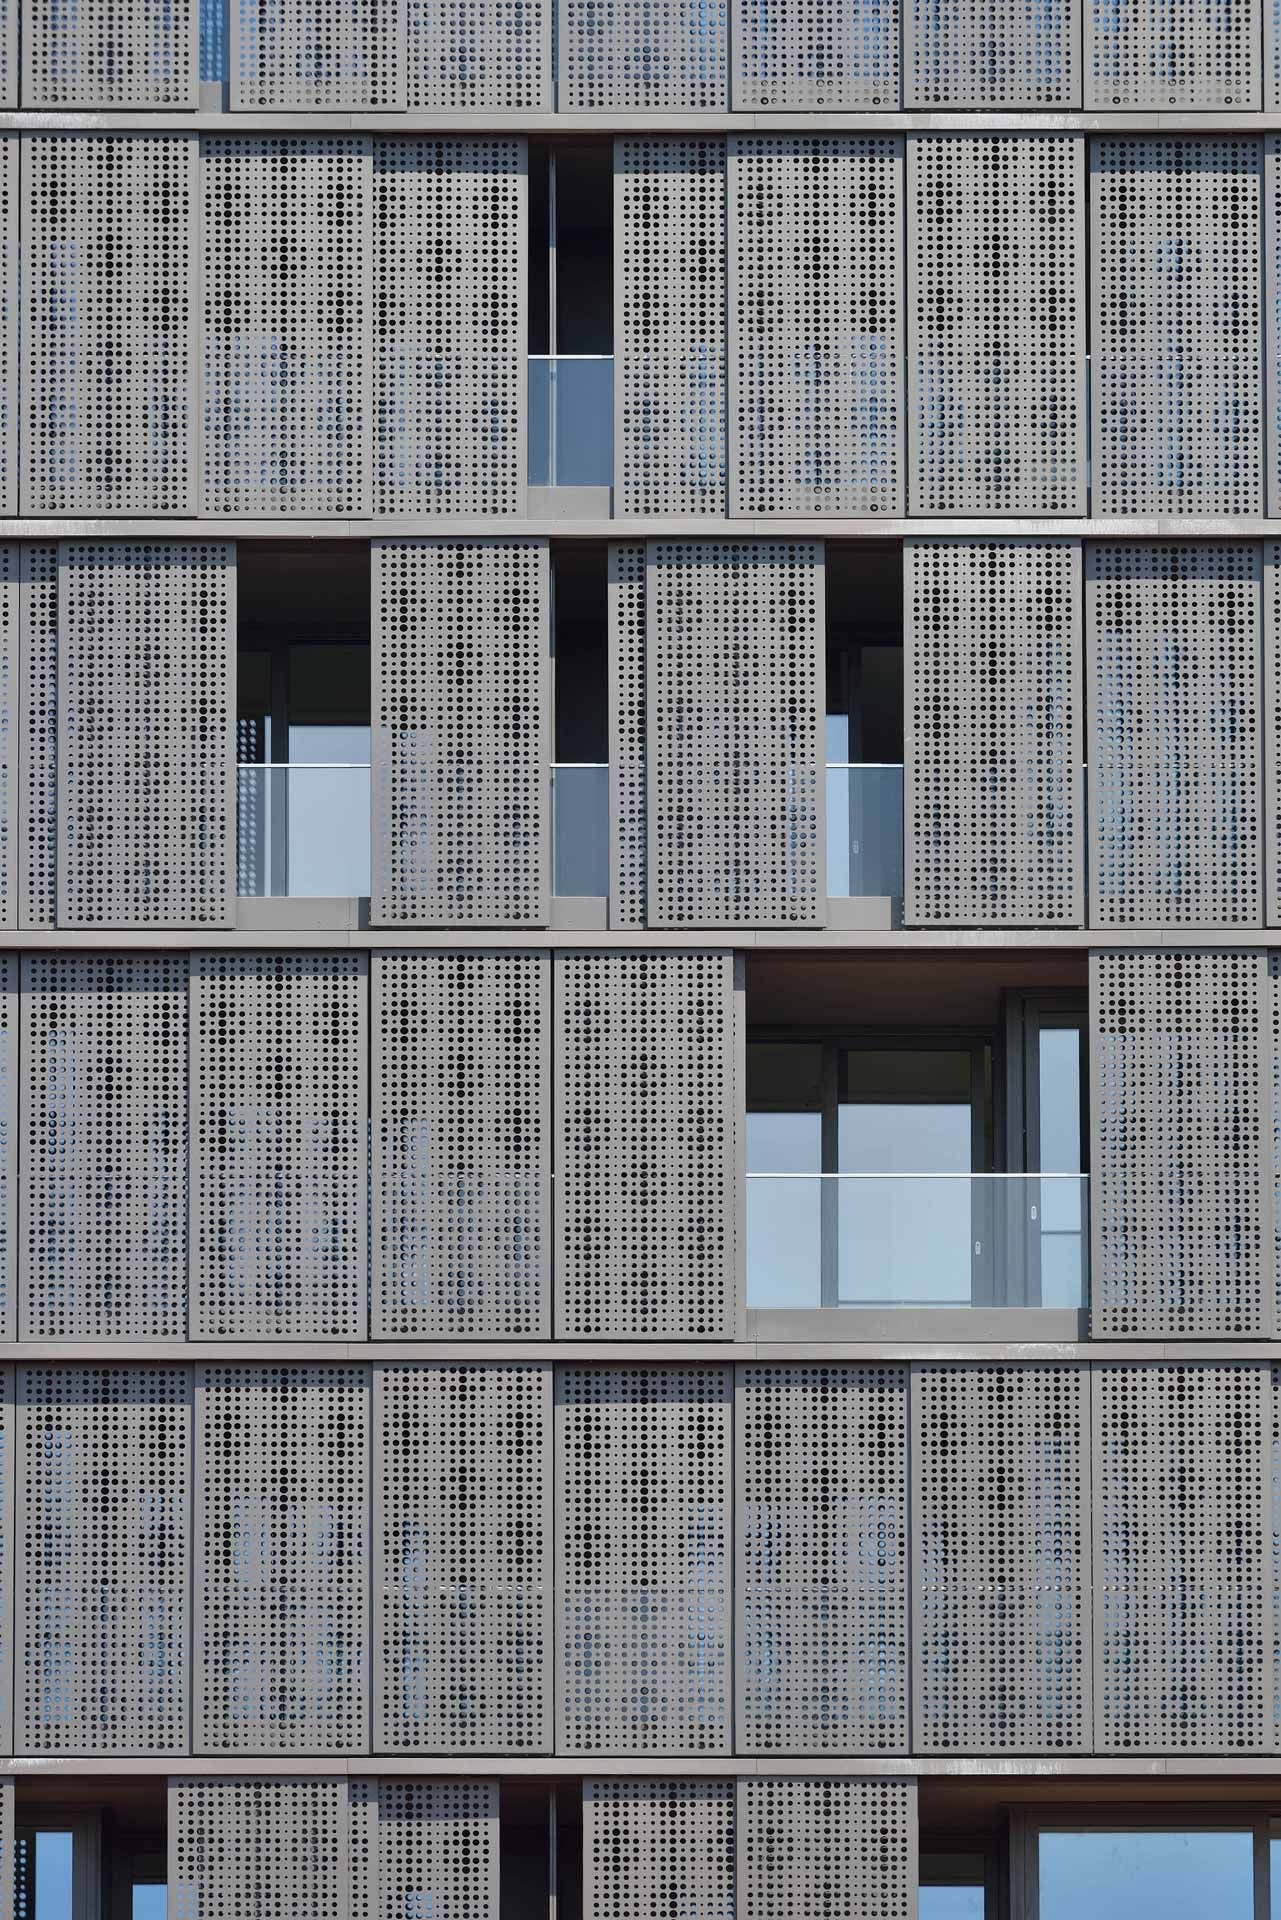 The Sliding Perforated Aluminium Panels Cladding The